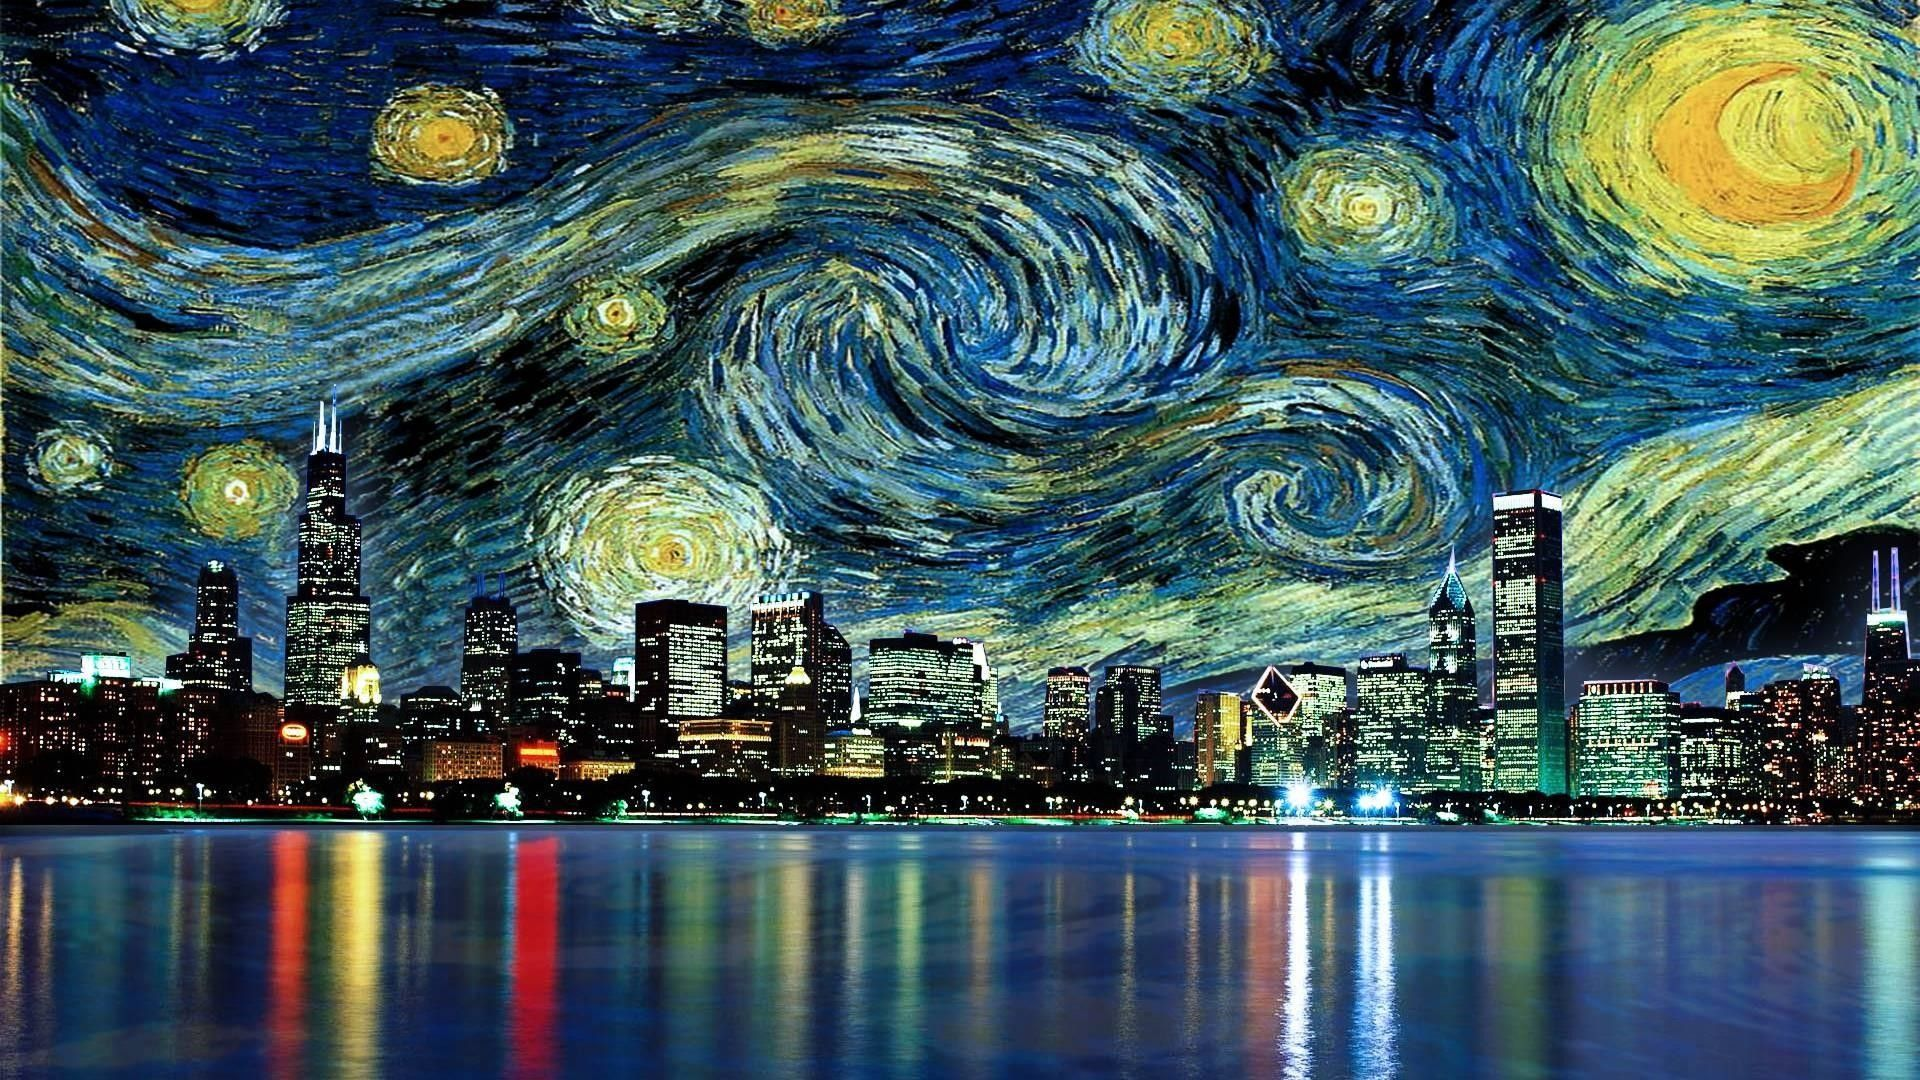 54 Van Gogh Wallpapers On Wallpaperplay In 2020 Starry Night Van Gogh Starry Night Wallpaper Gogh The Starry Night